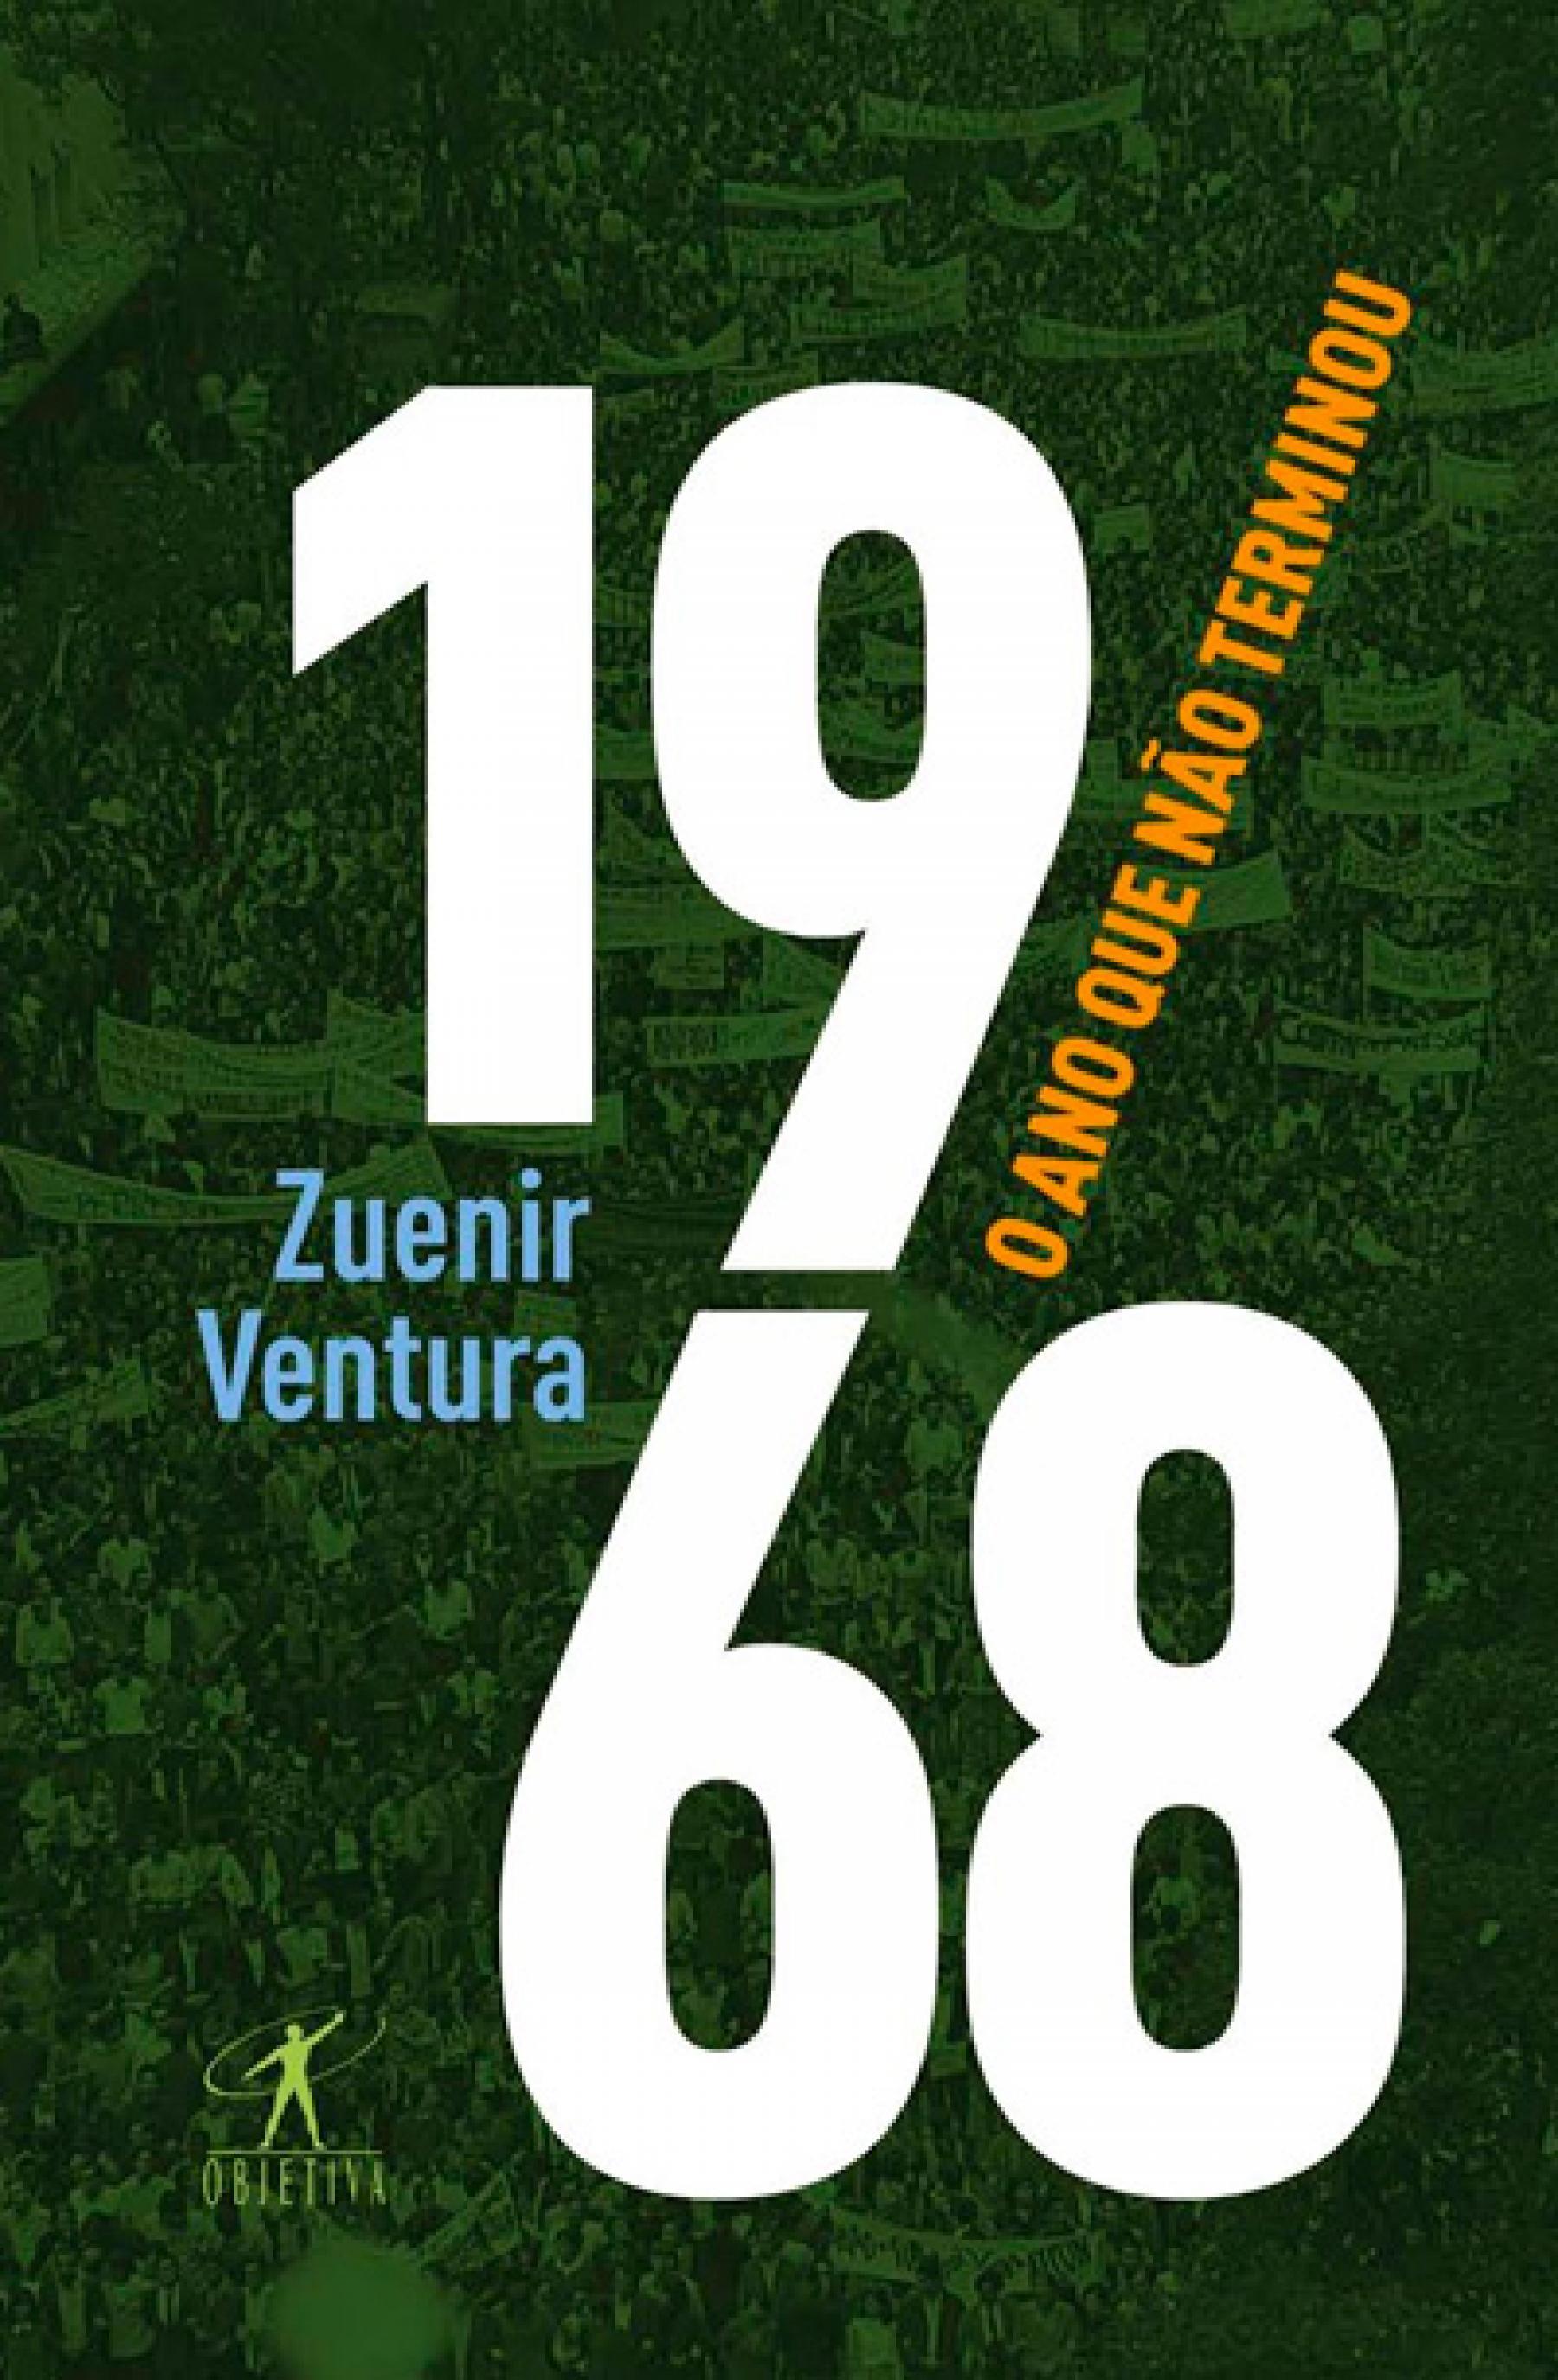 Zuenir Ventura